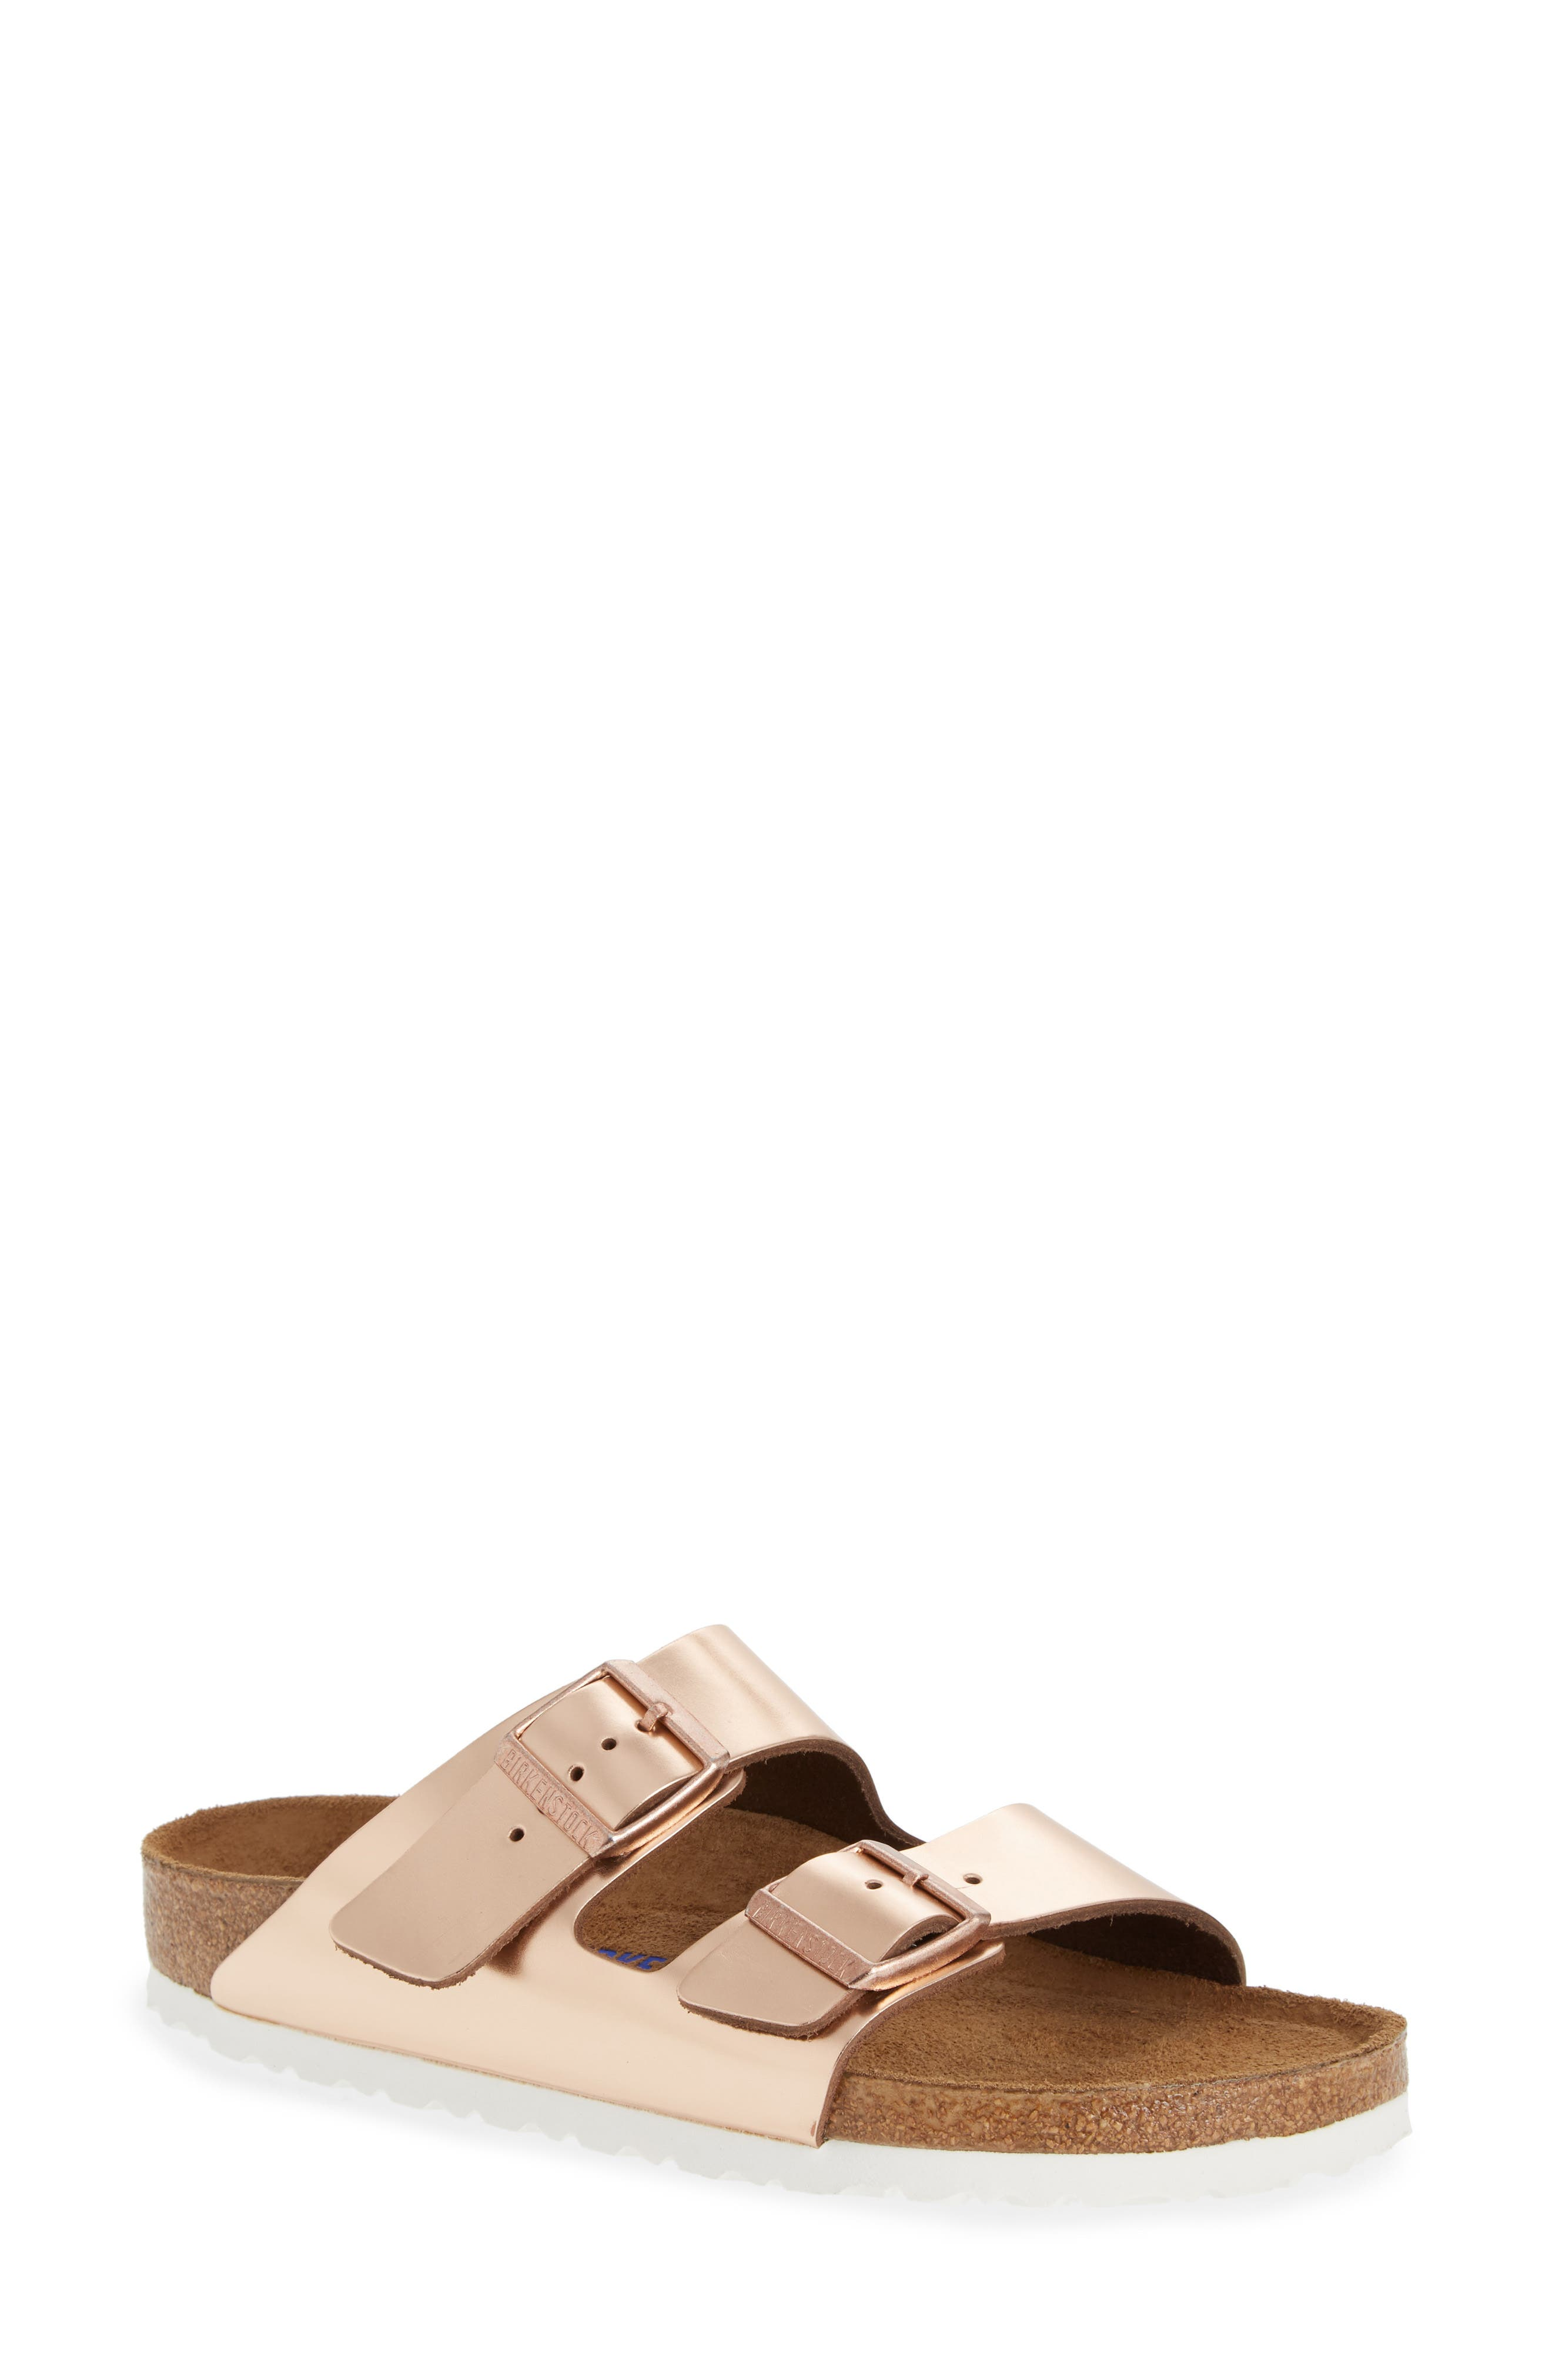 Arizona Soft Footbed Sandal,                             Main thumbnail 1, color,                             COPPER LEATHER